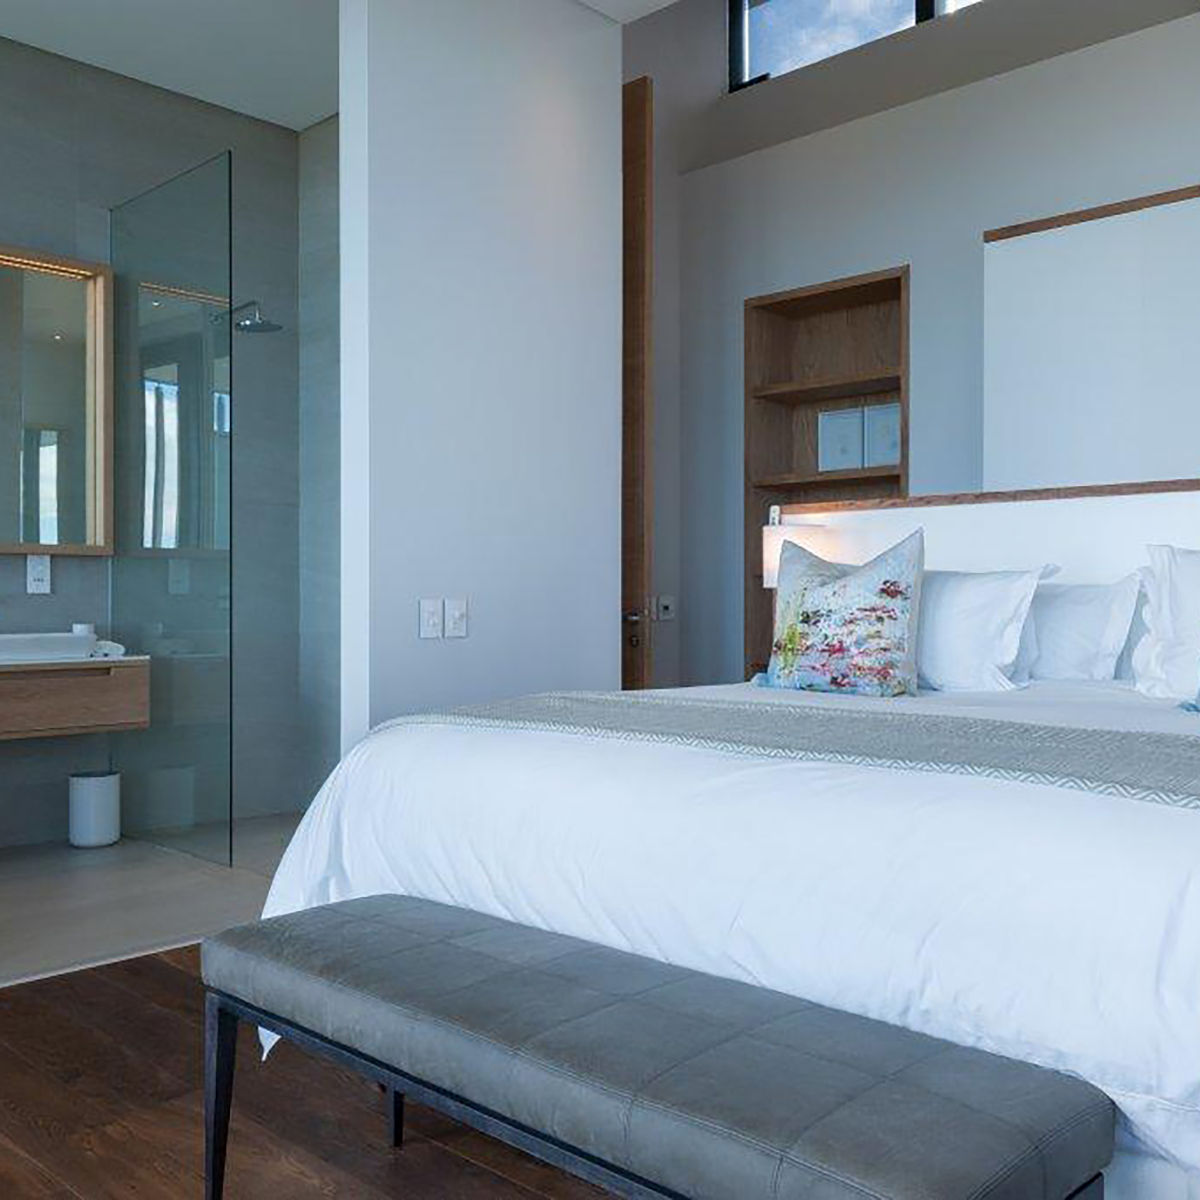 http://www.okha.com/wp-content/uploads/2017/05/grootbos-villa-2-second-bedroom-.jpg